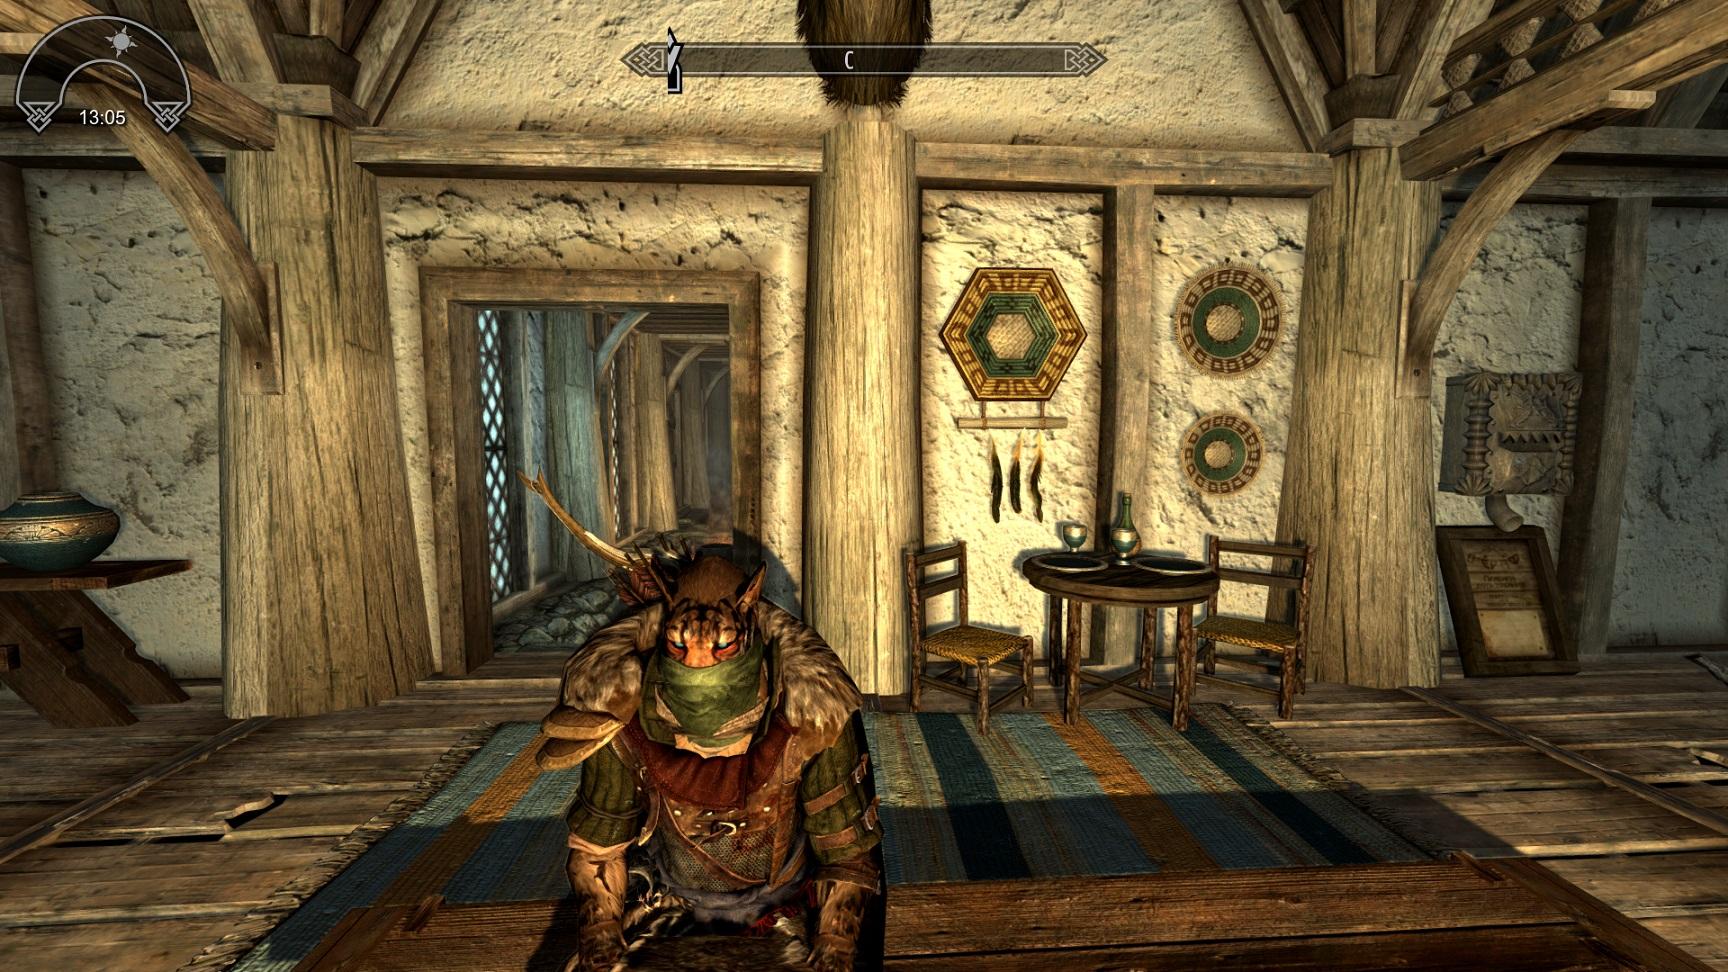 TESV 2013-12-17 00-50-12-41.jpg - Elder Scrolls 5: Skyrim, the